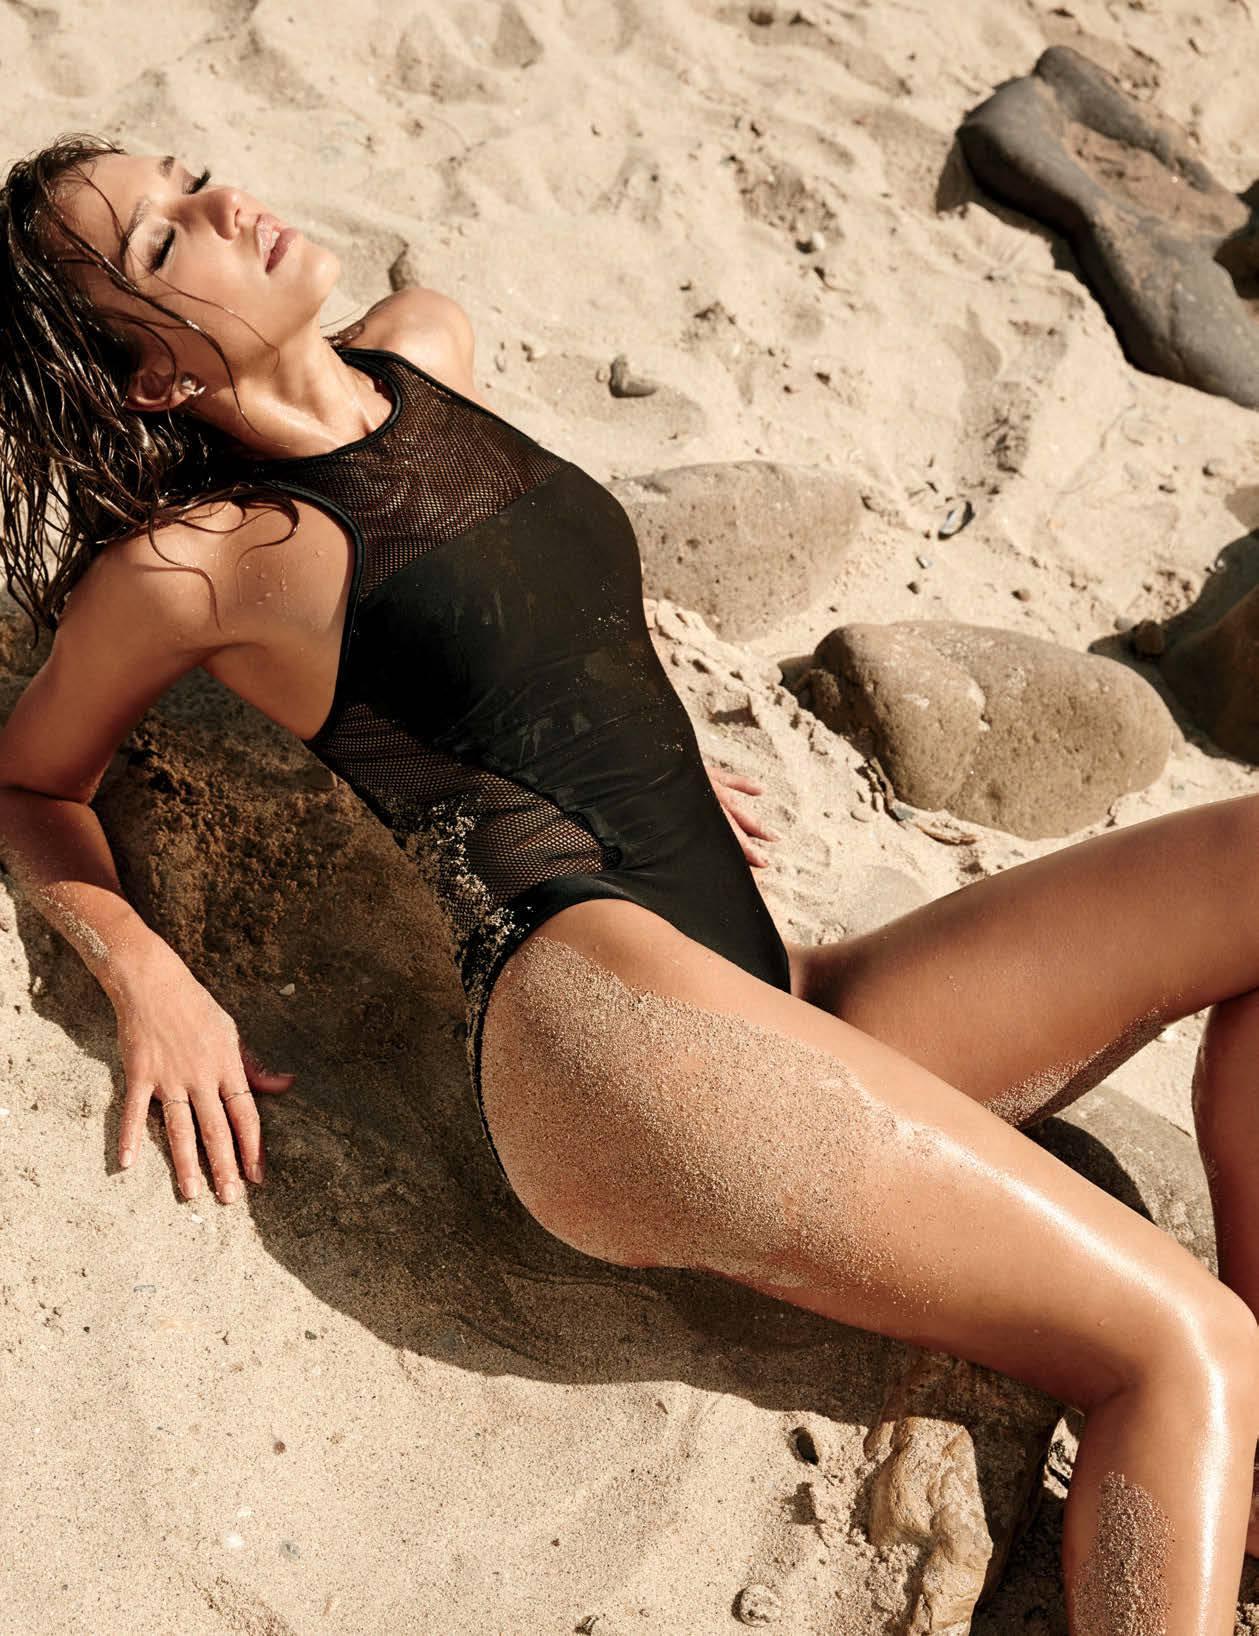 Jessica Alba – Beautiful Body In Sexy Photoshoot For Maxim Magazine (september 2014) (hq) 0011